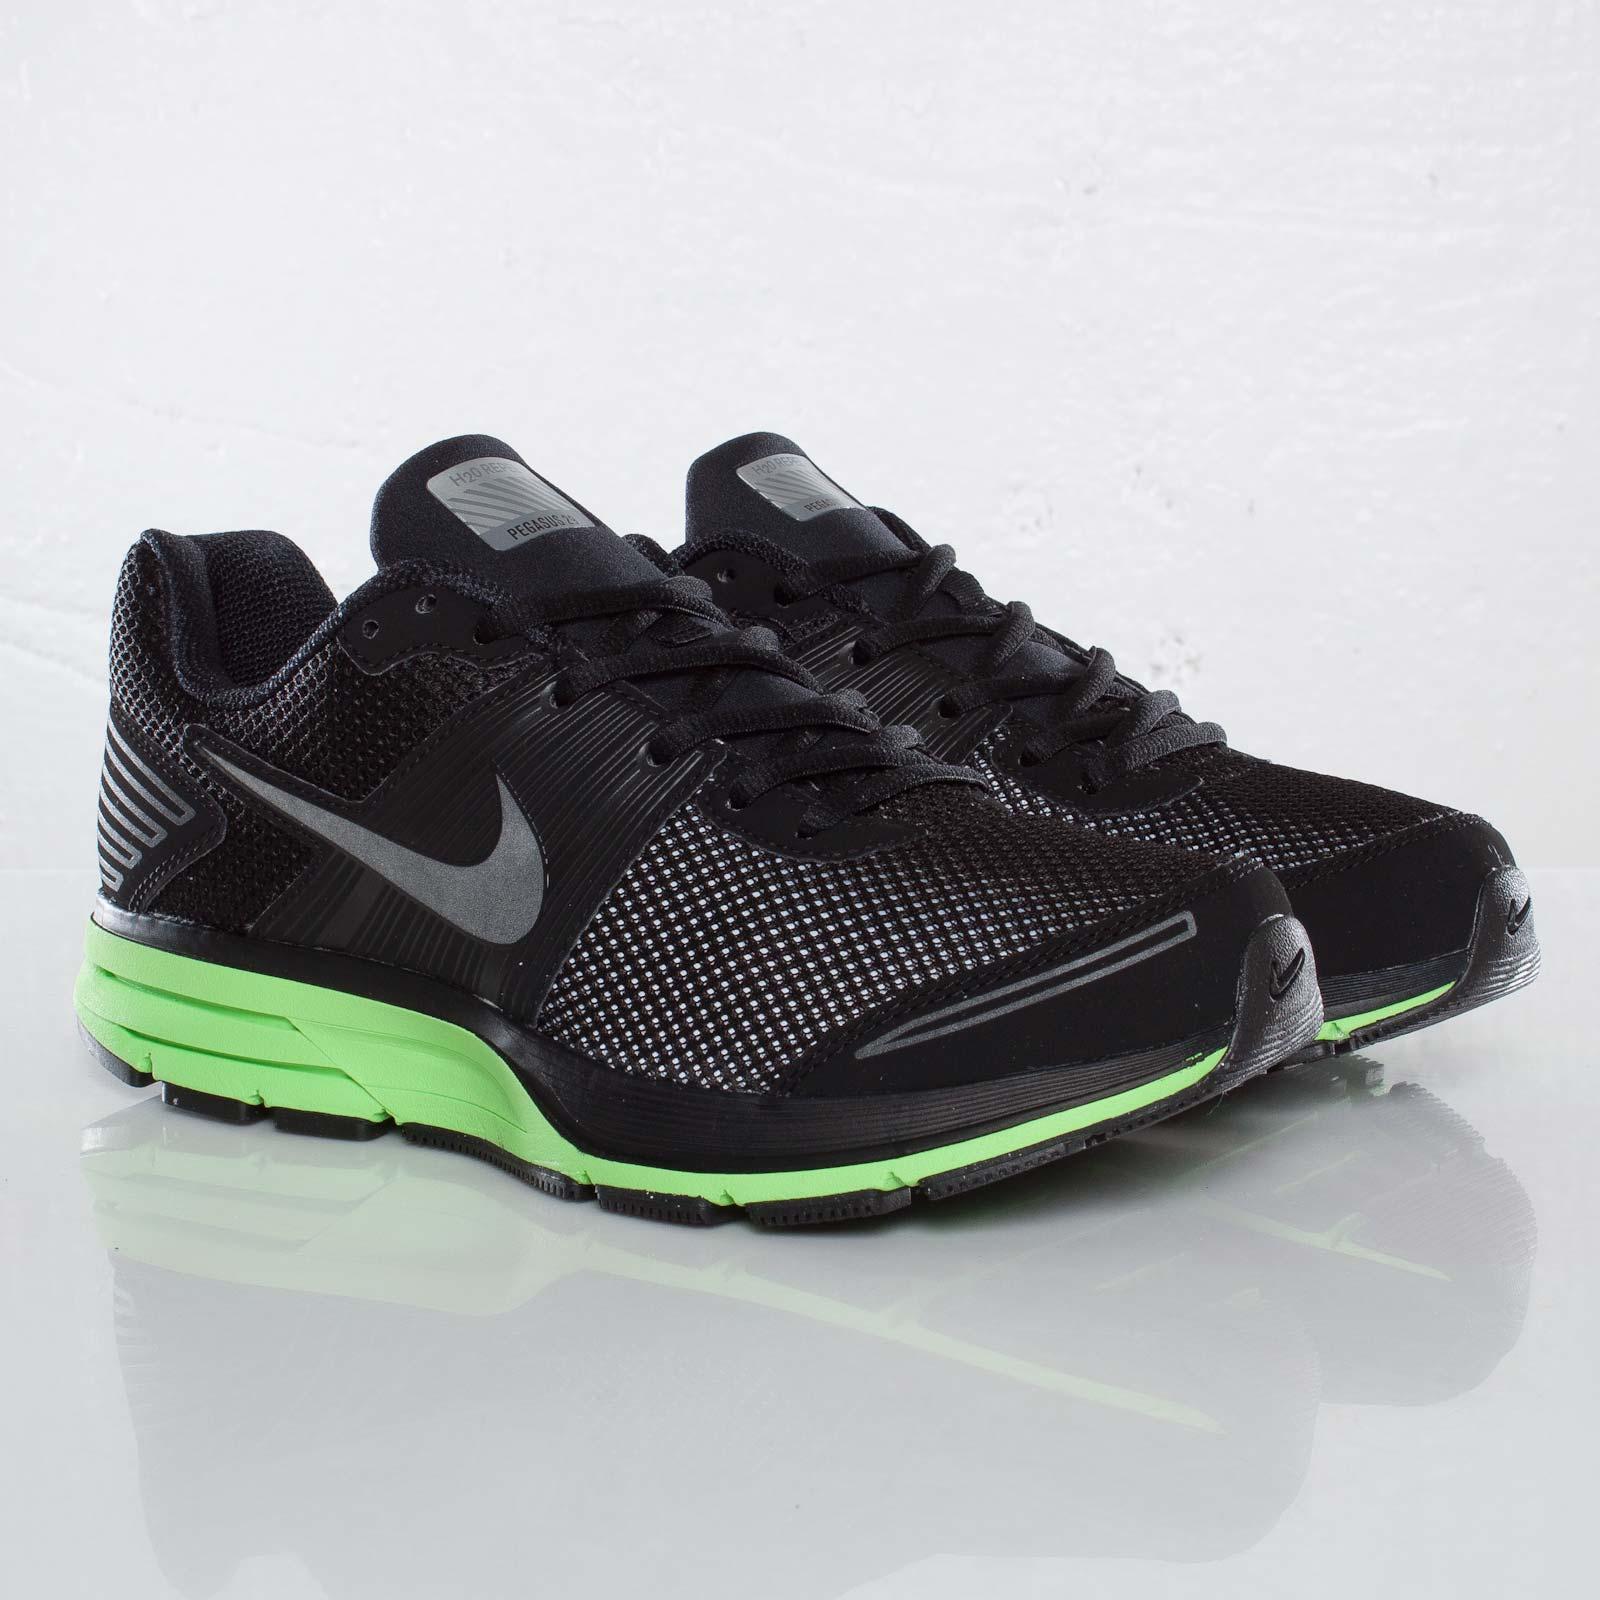 e5ac6f562702b Nike Air Pegasus+ 29 Shield - 536865-003 - Sneakersnstuff